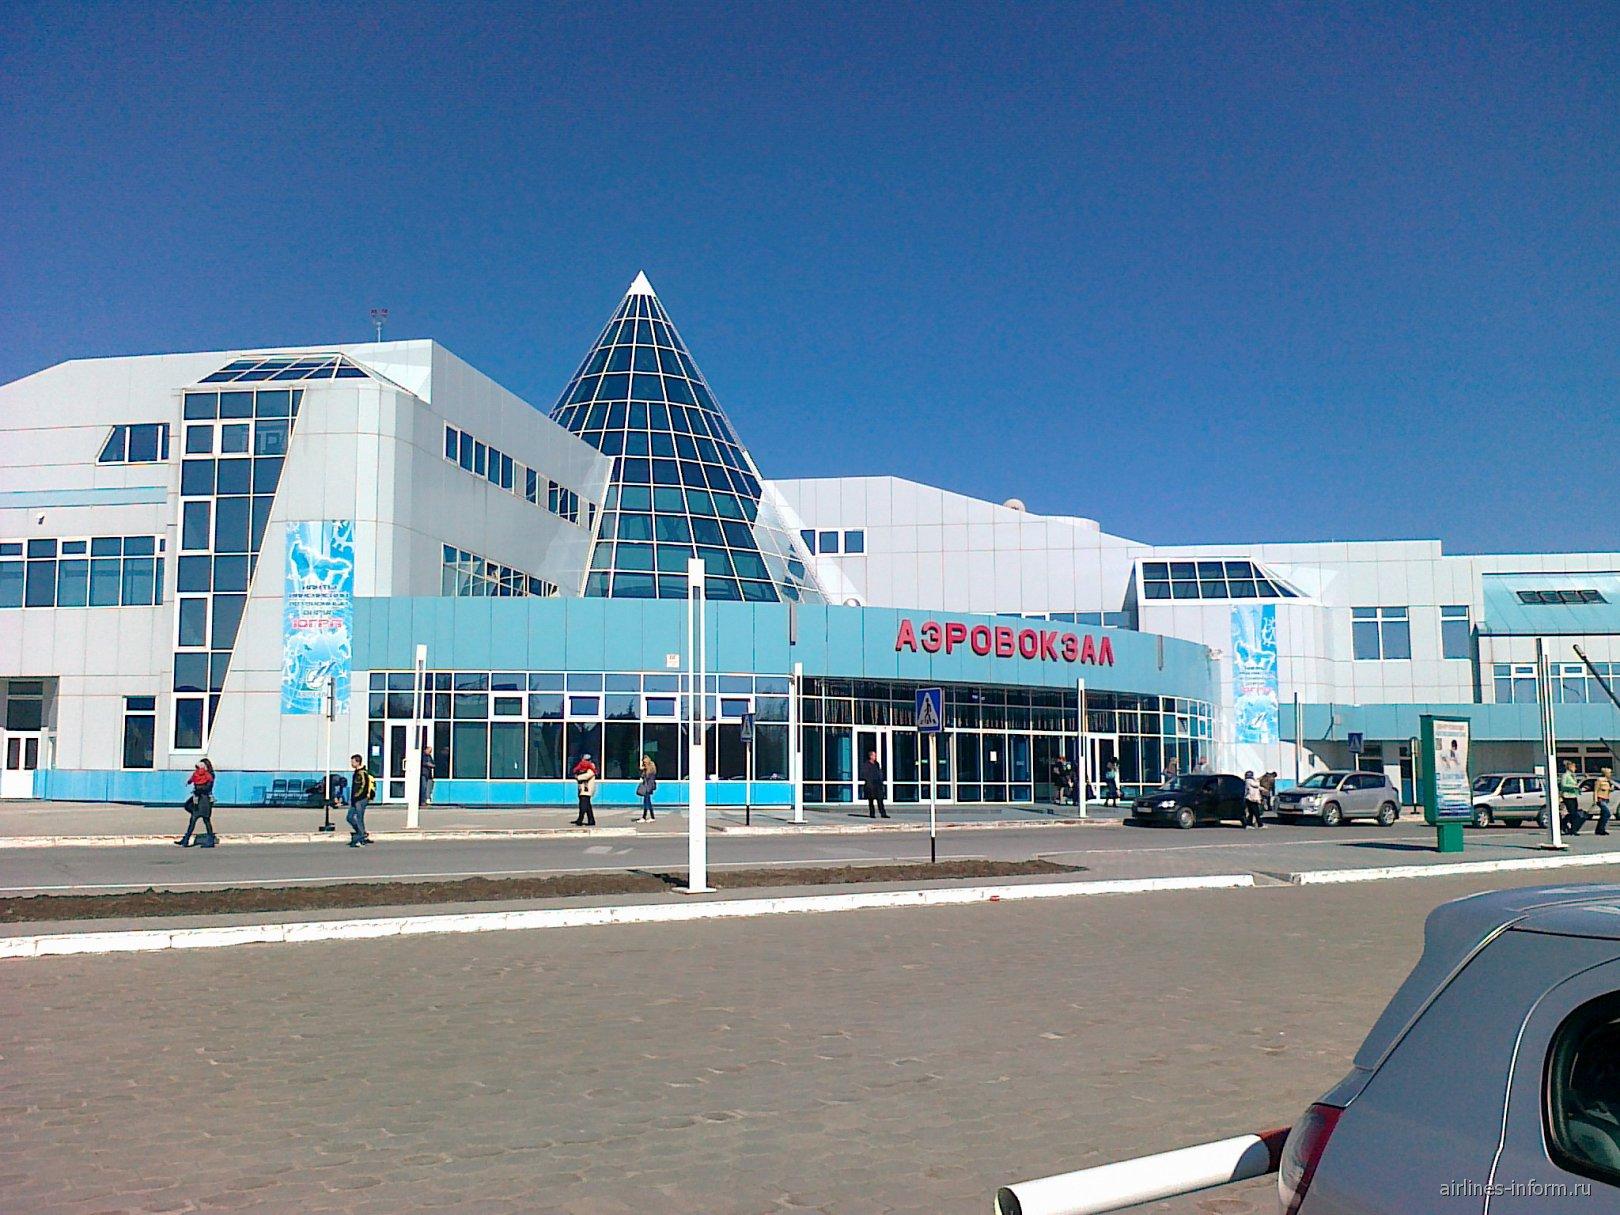 Аэровокзал аэропорта Ханты-Мансийск